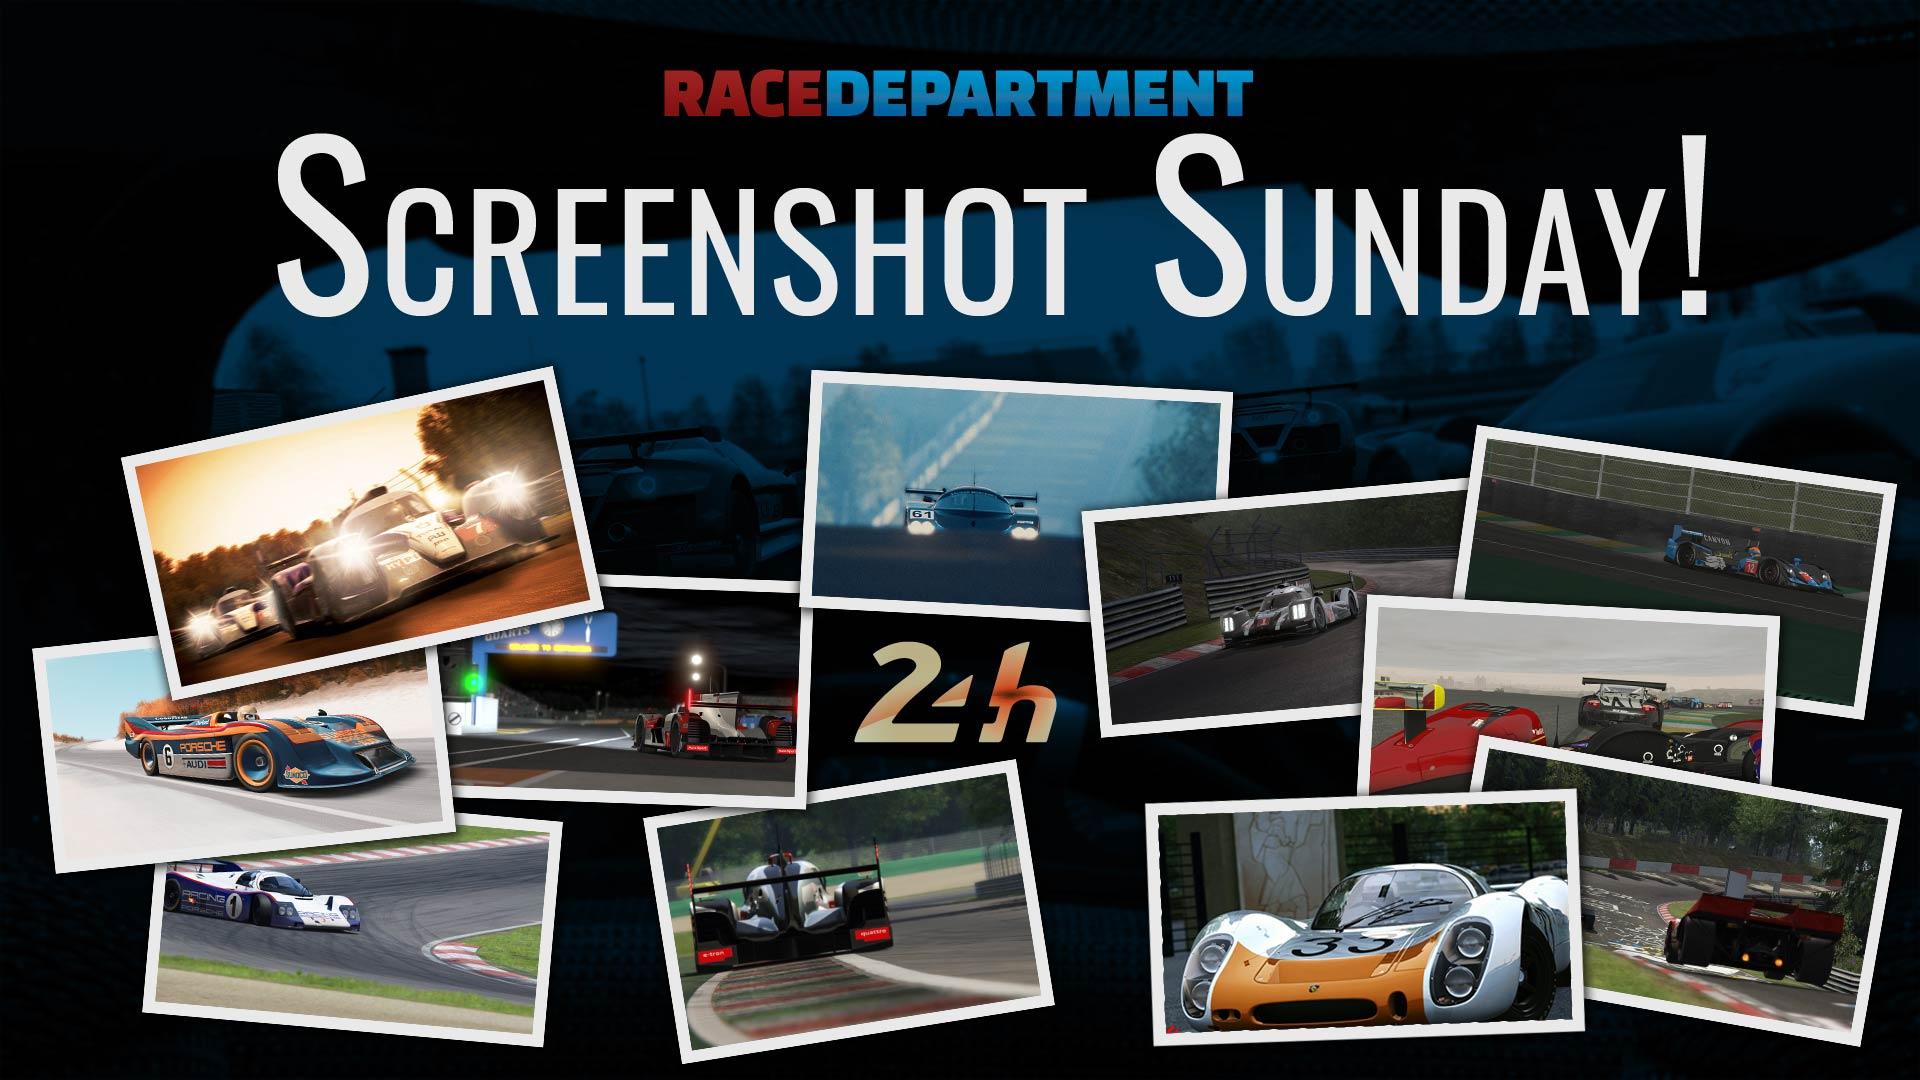 Screenshot Sunday - Endurance.jpg